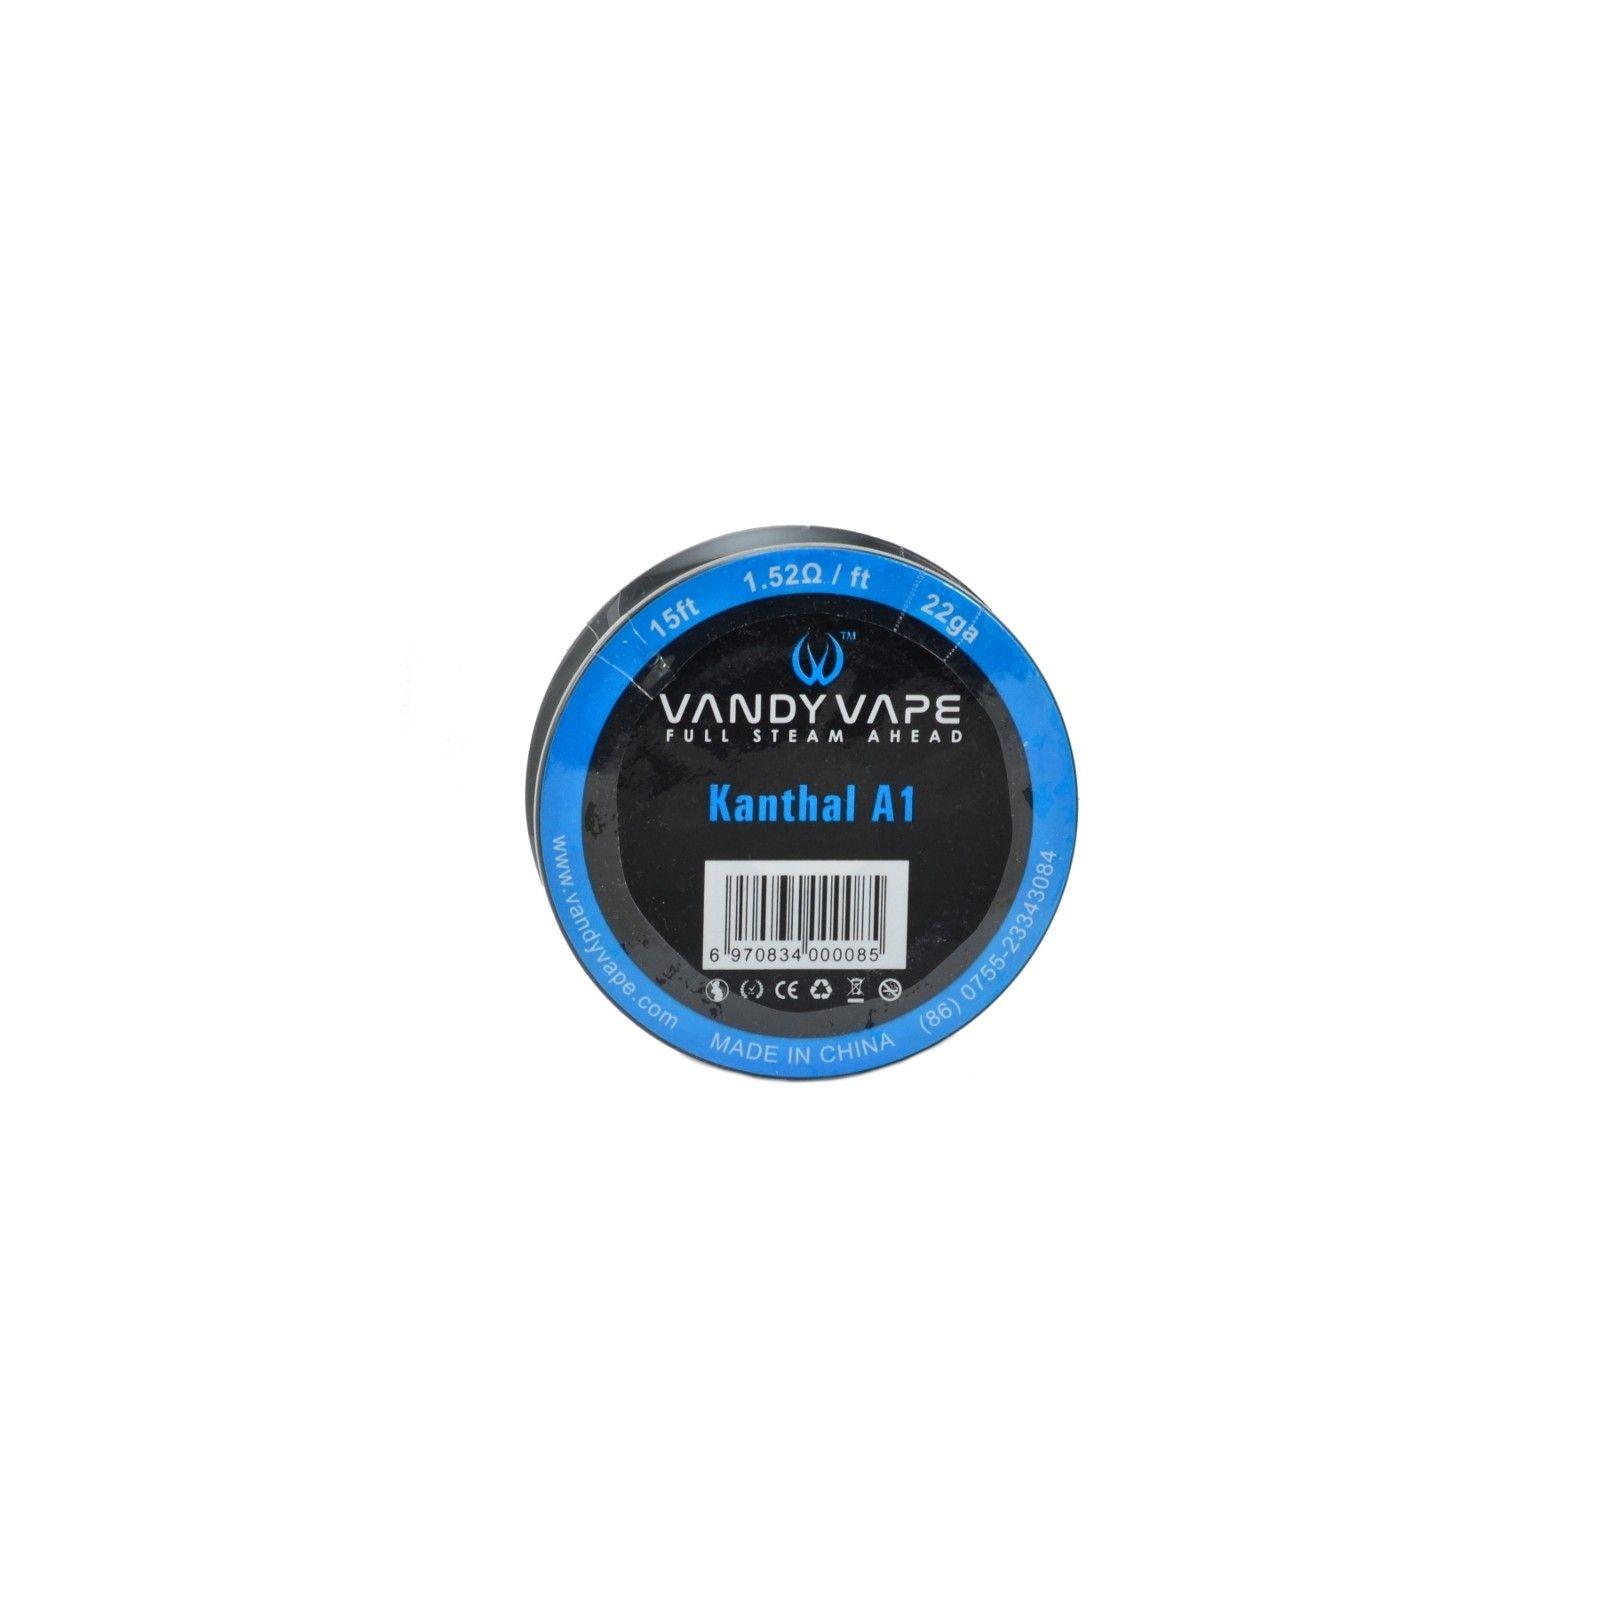 Kanthal A1 - Vandy Vape